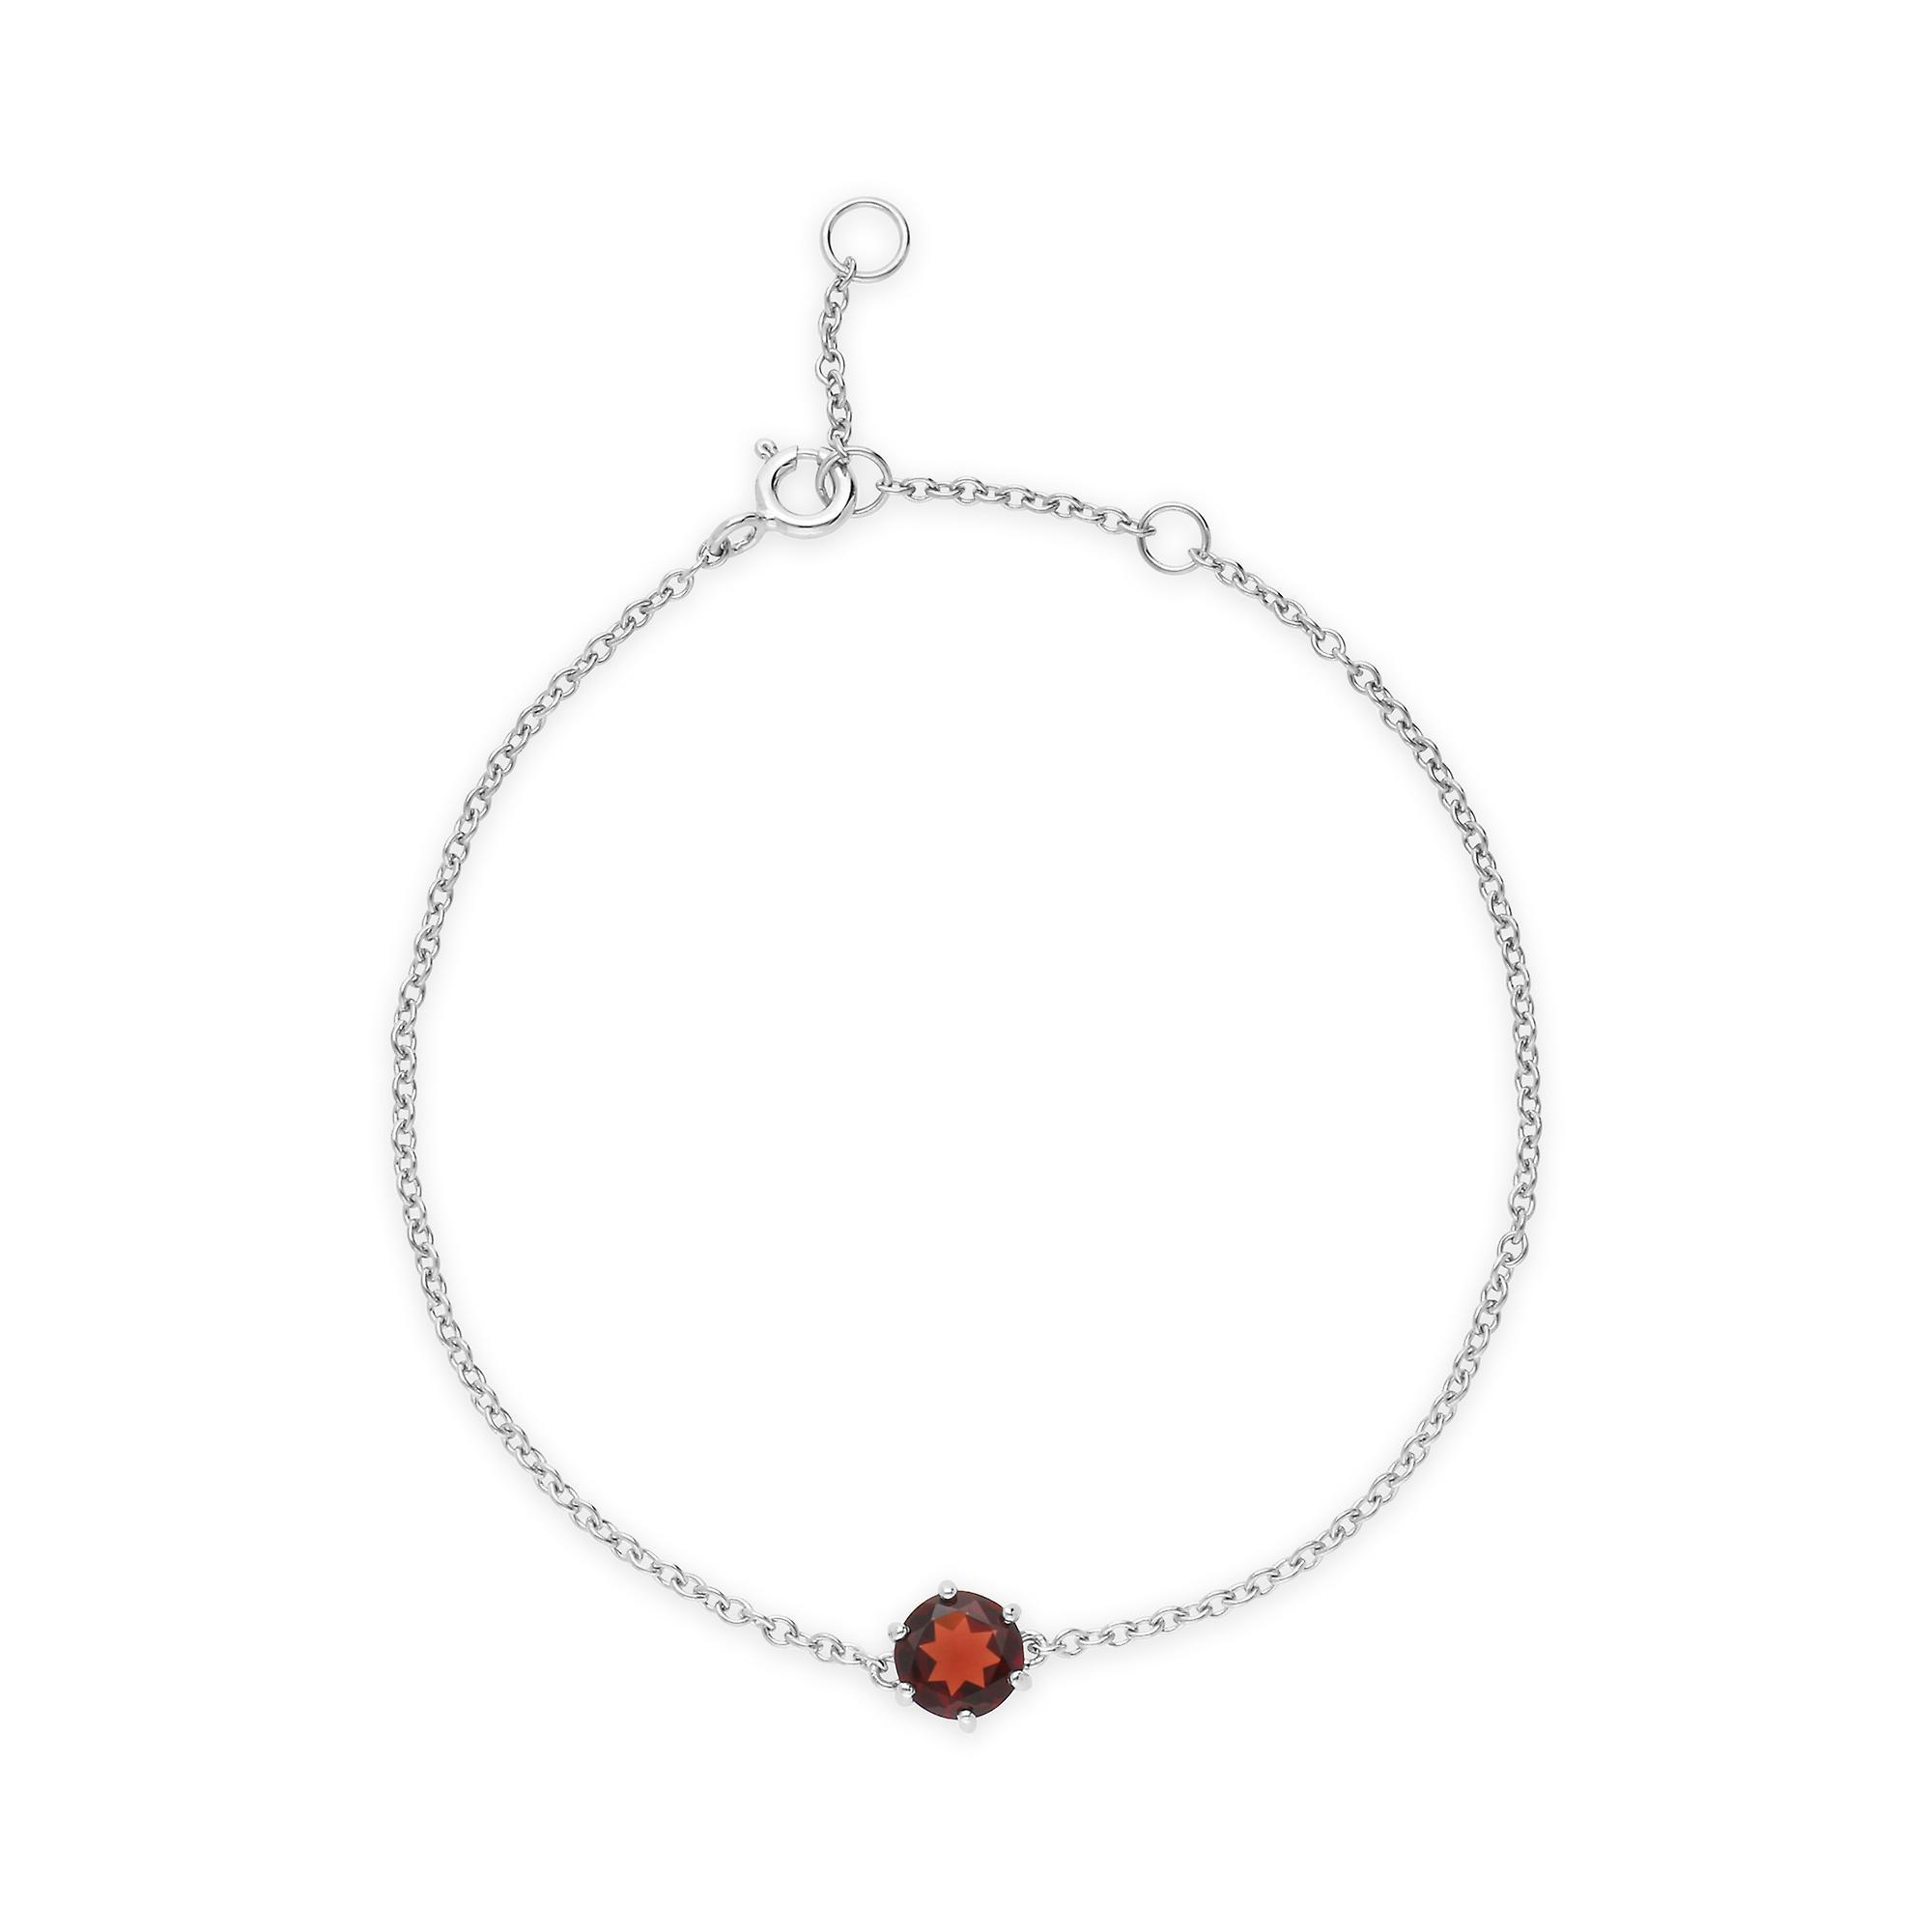 Gemondo Sterling Silver Garnet January Single Stone 19cm Bracelet